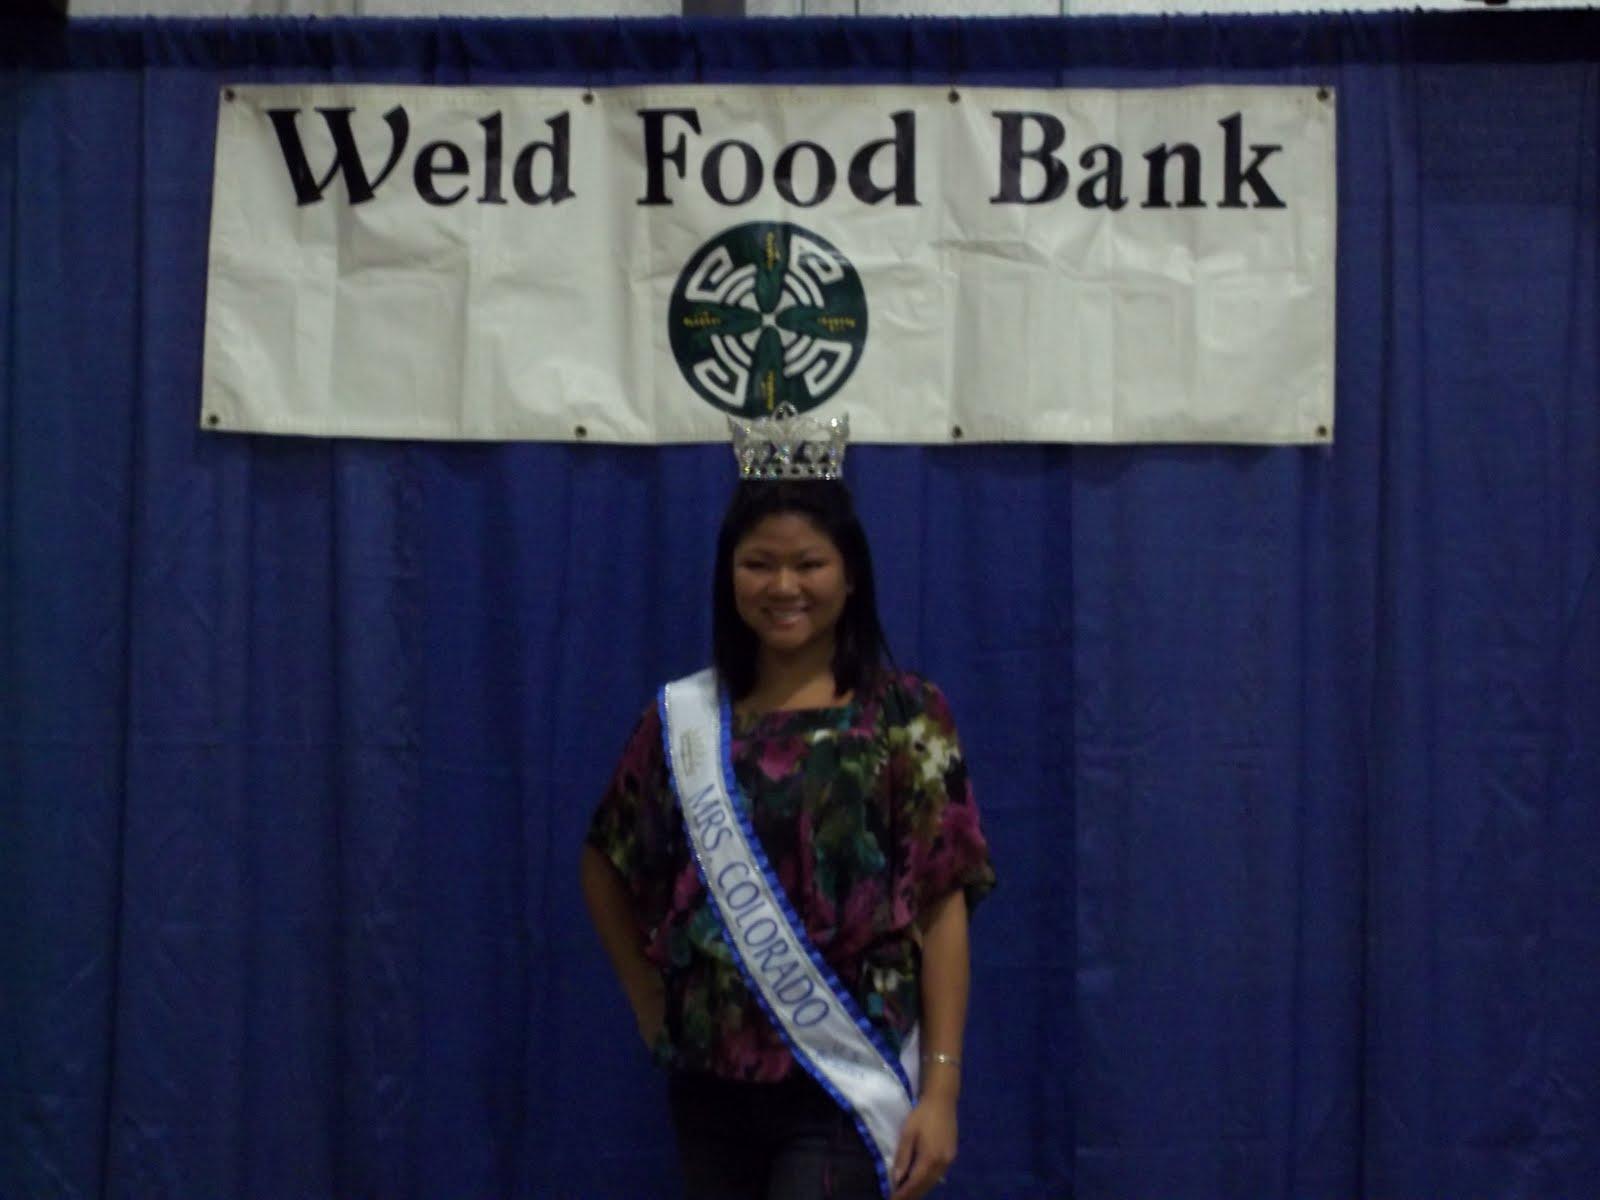 Weld Food Bank Volunteer